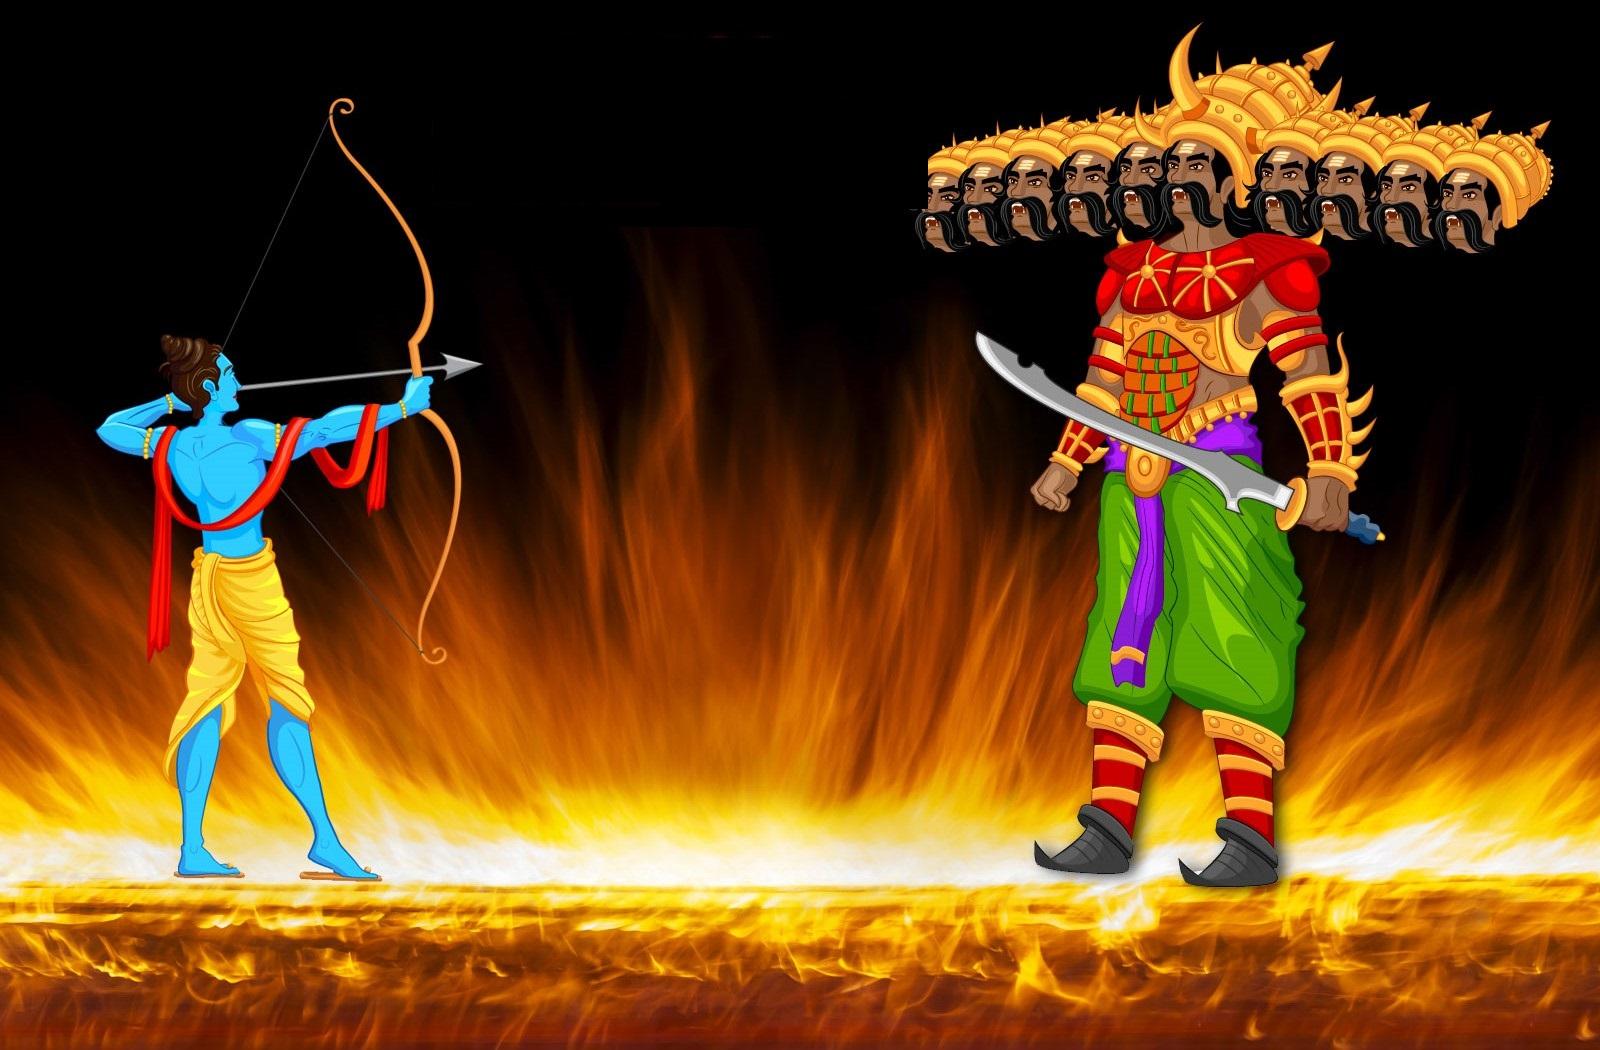 PunjabKesari, Dussehra, दशहरा, दशमी, Dashmi tithi, Dashmi, Sri ram, Ravana